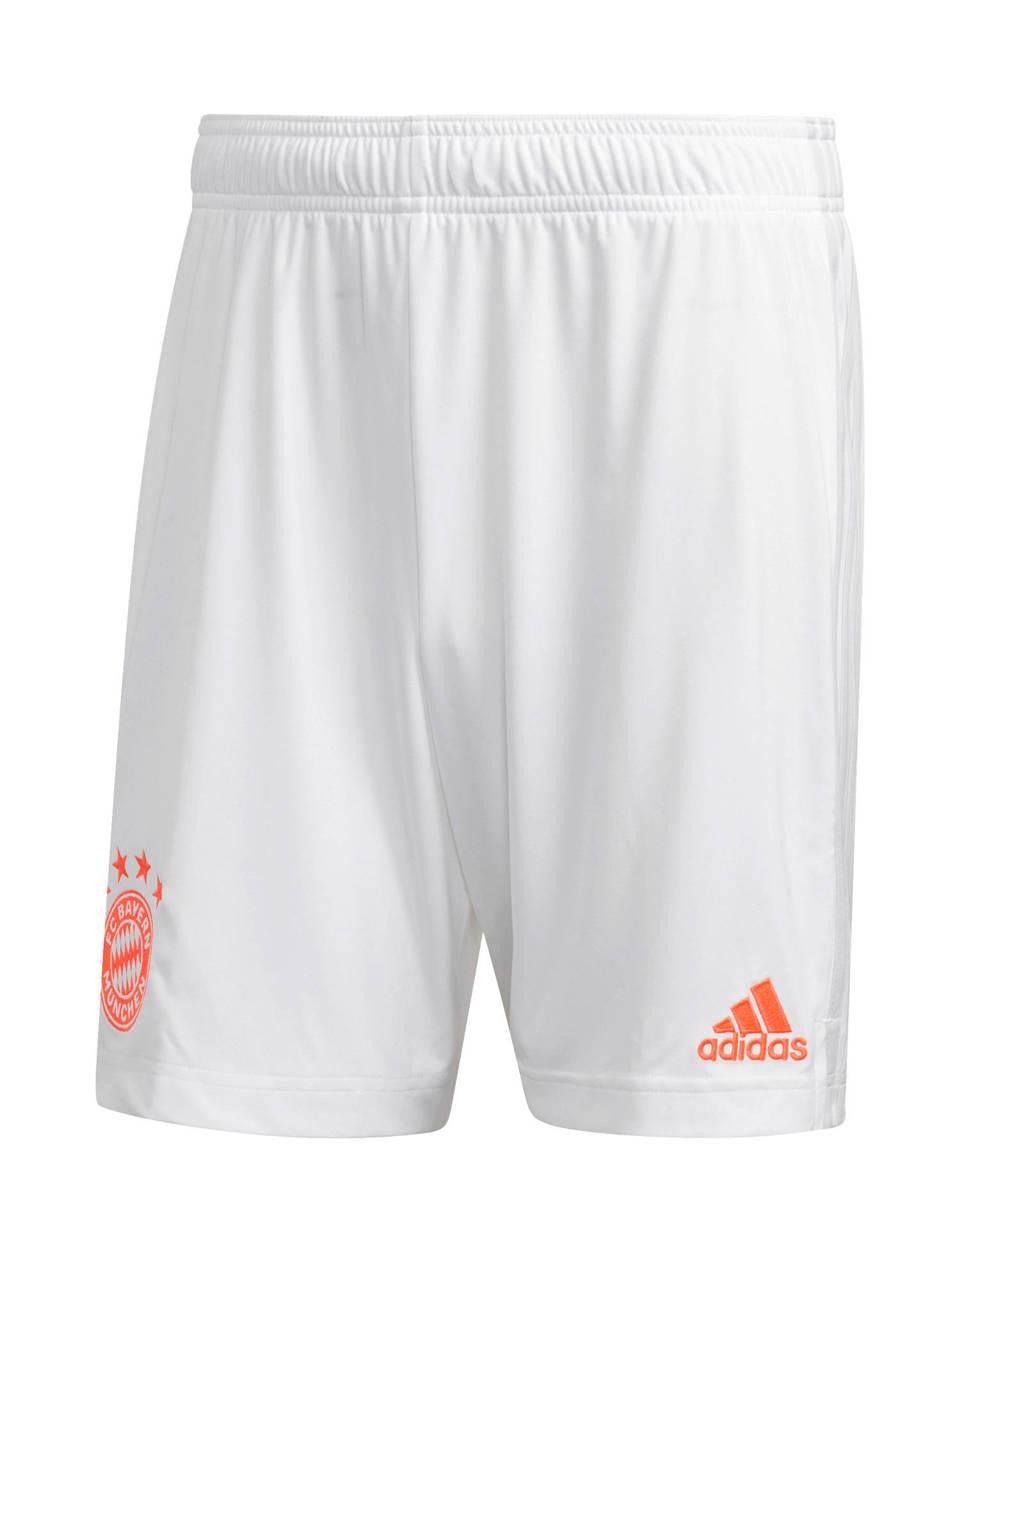 adidas Performance Senior FC Bayern München uit short wit/oranje, Wit/oranje